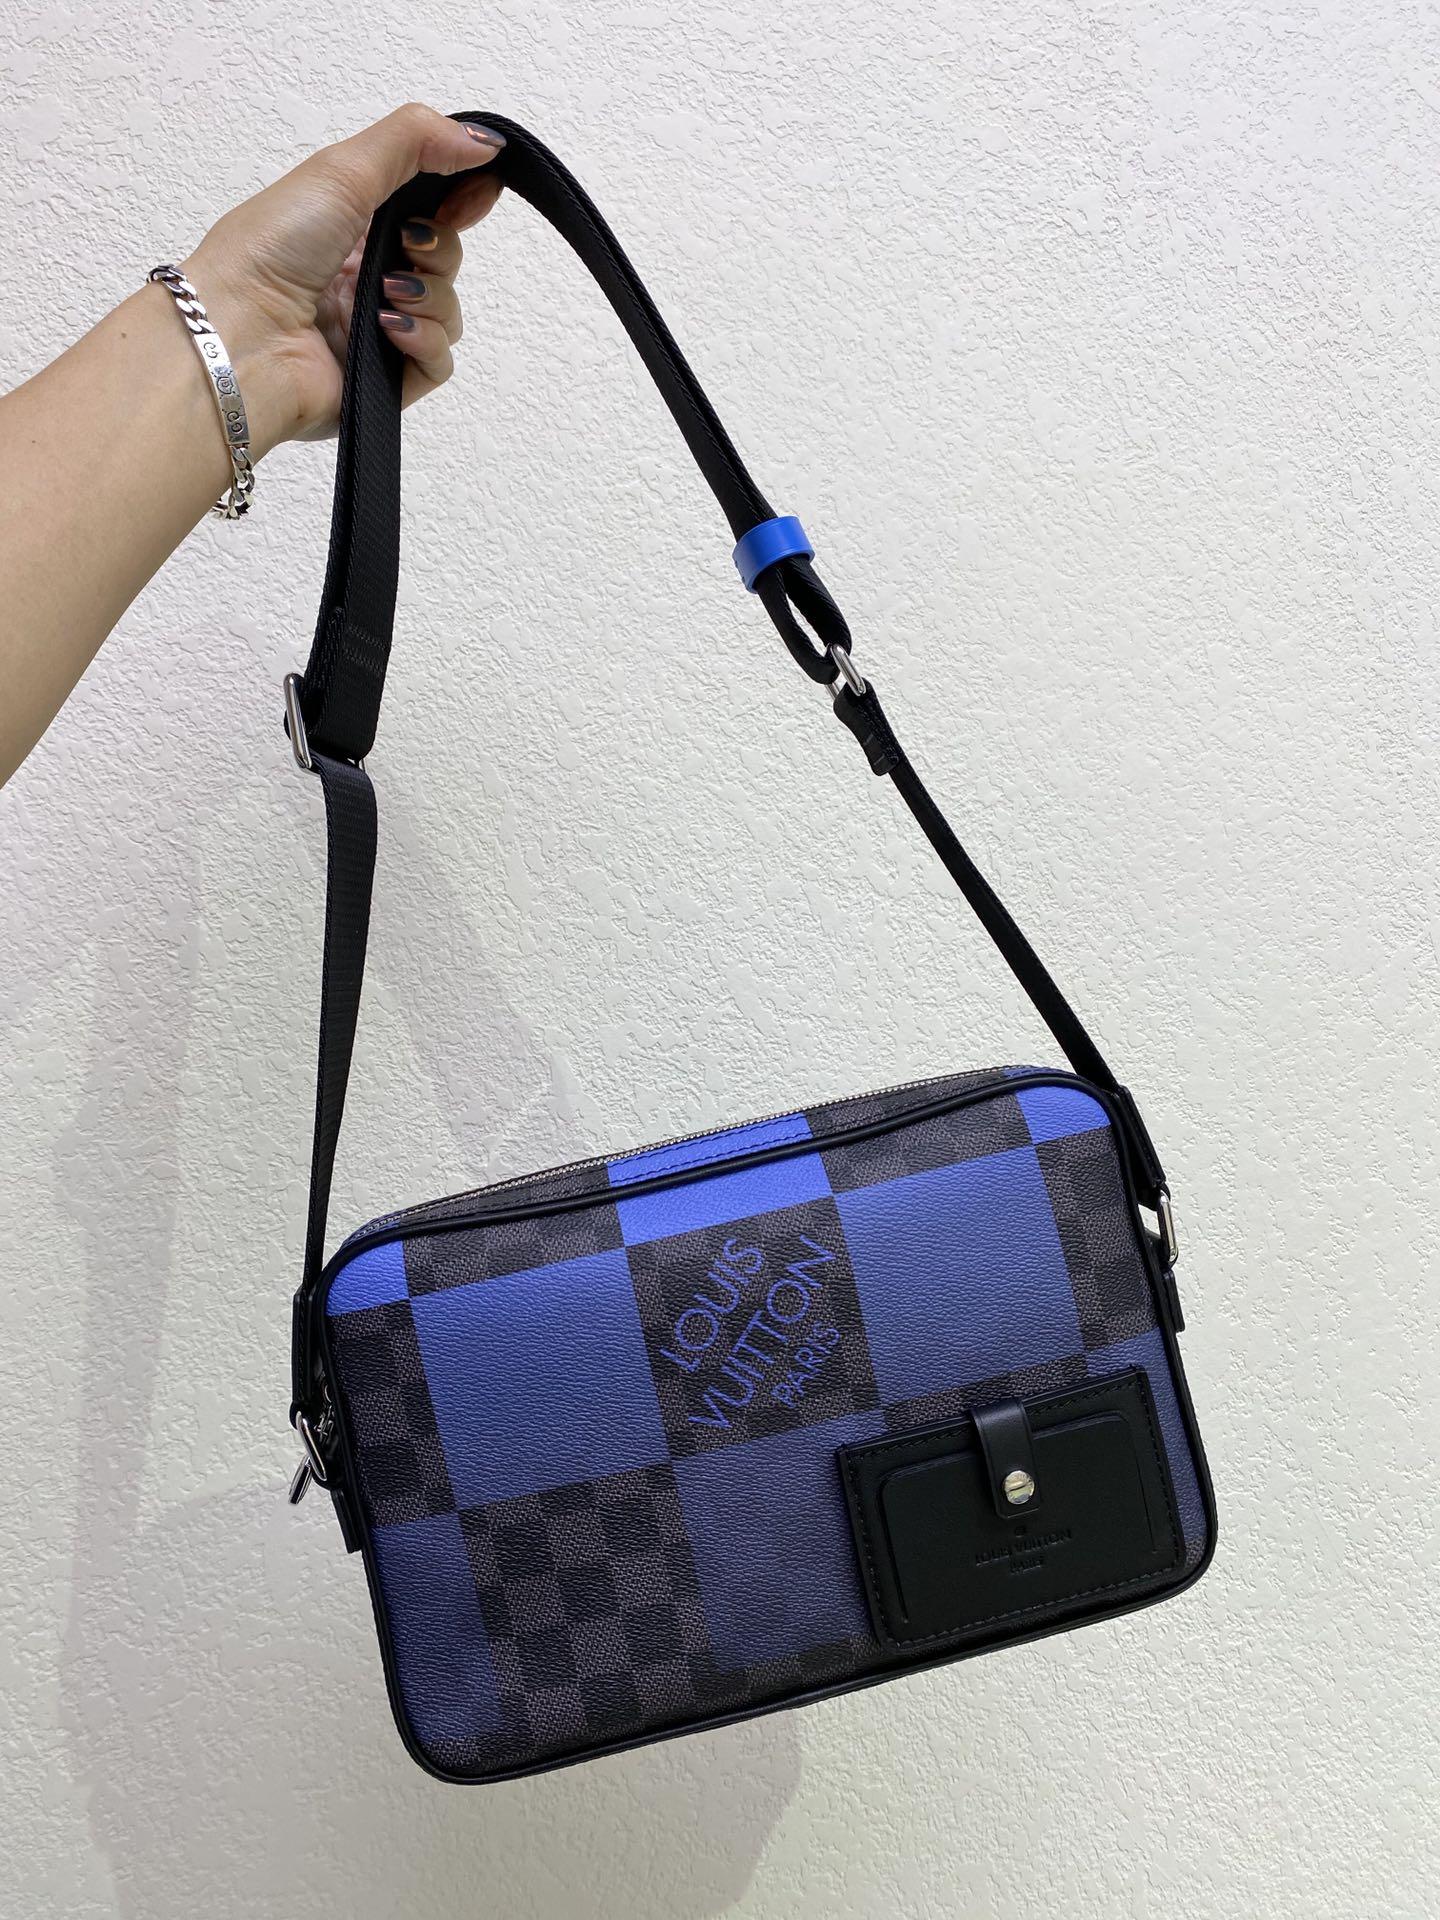 【¥980】LV包包官网 新款Alpha邮差包40408 设计时尚